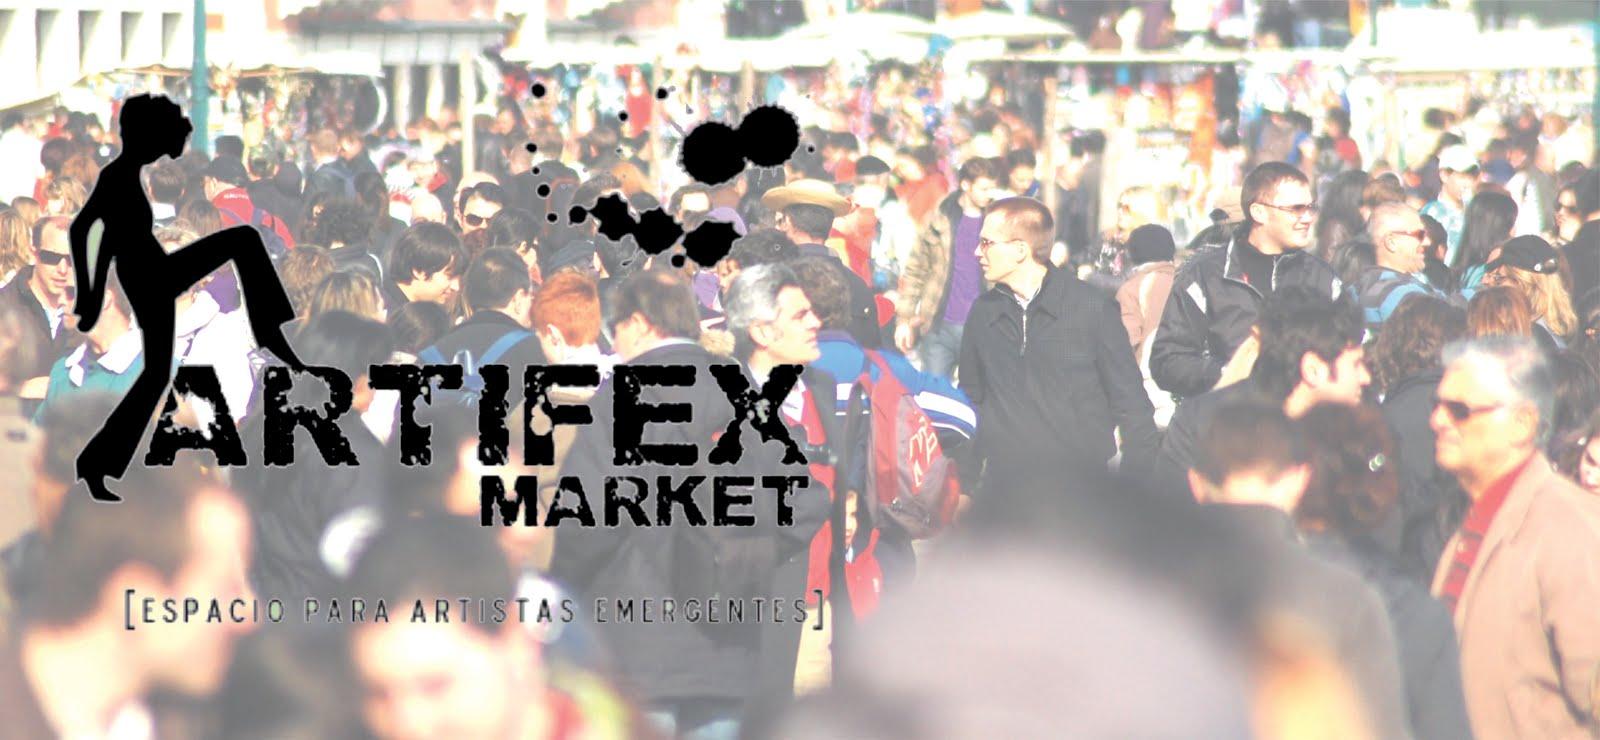 Artifex Market